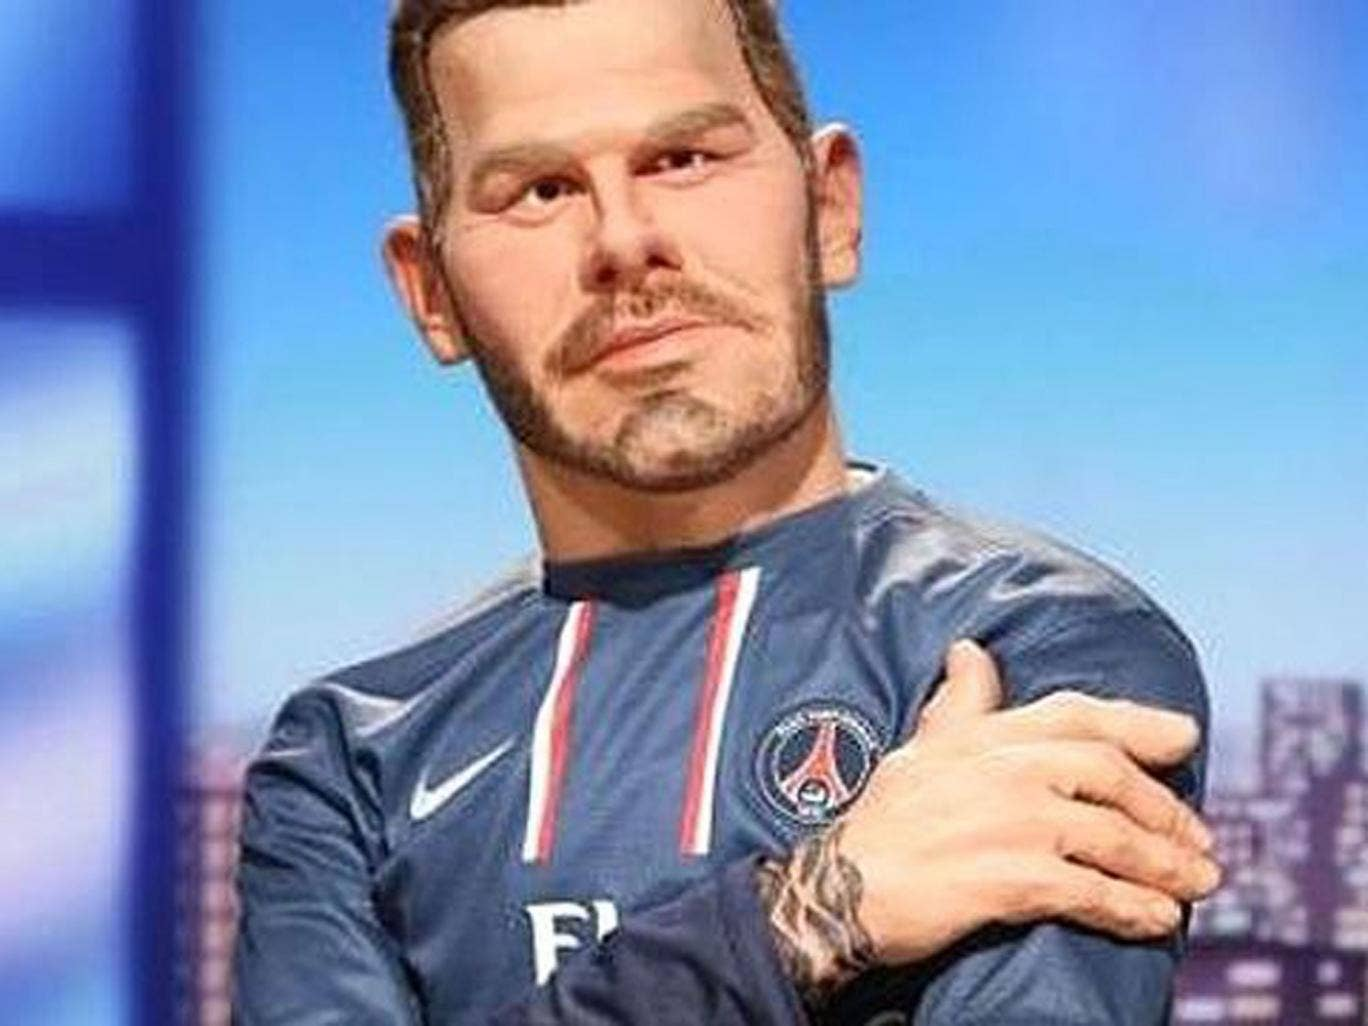 David Beckham's puppet on Les Guignols de l'info